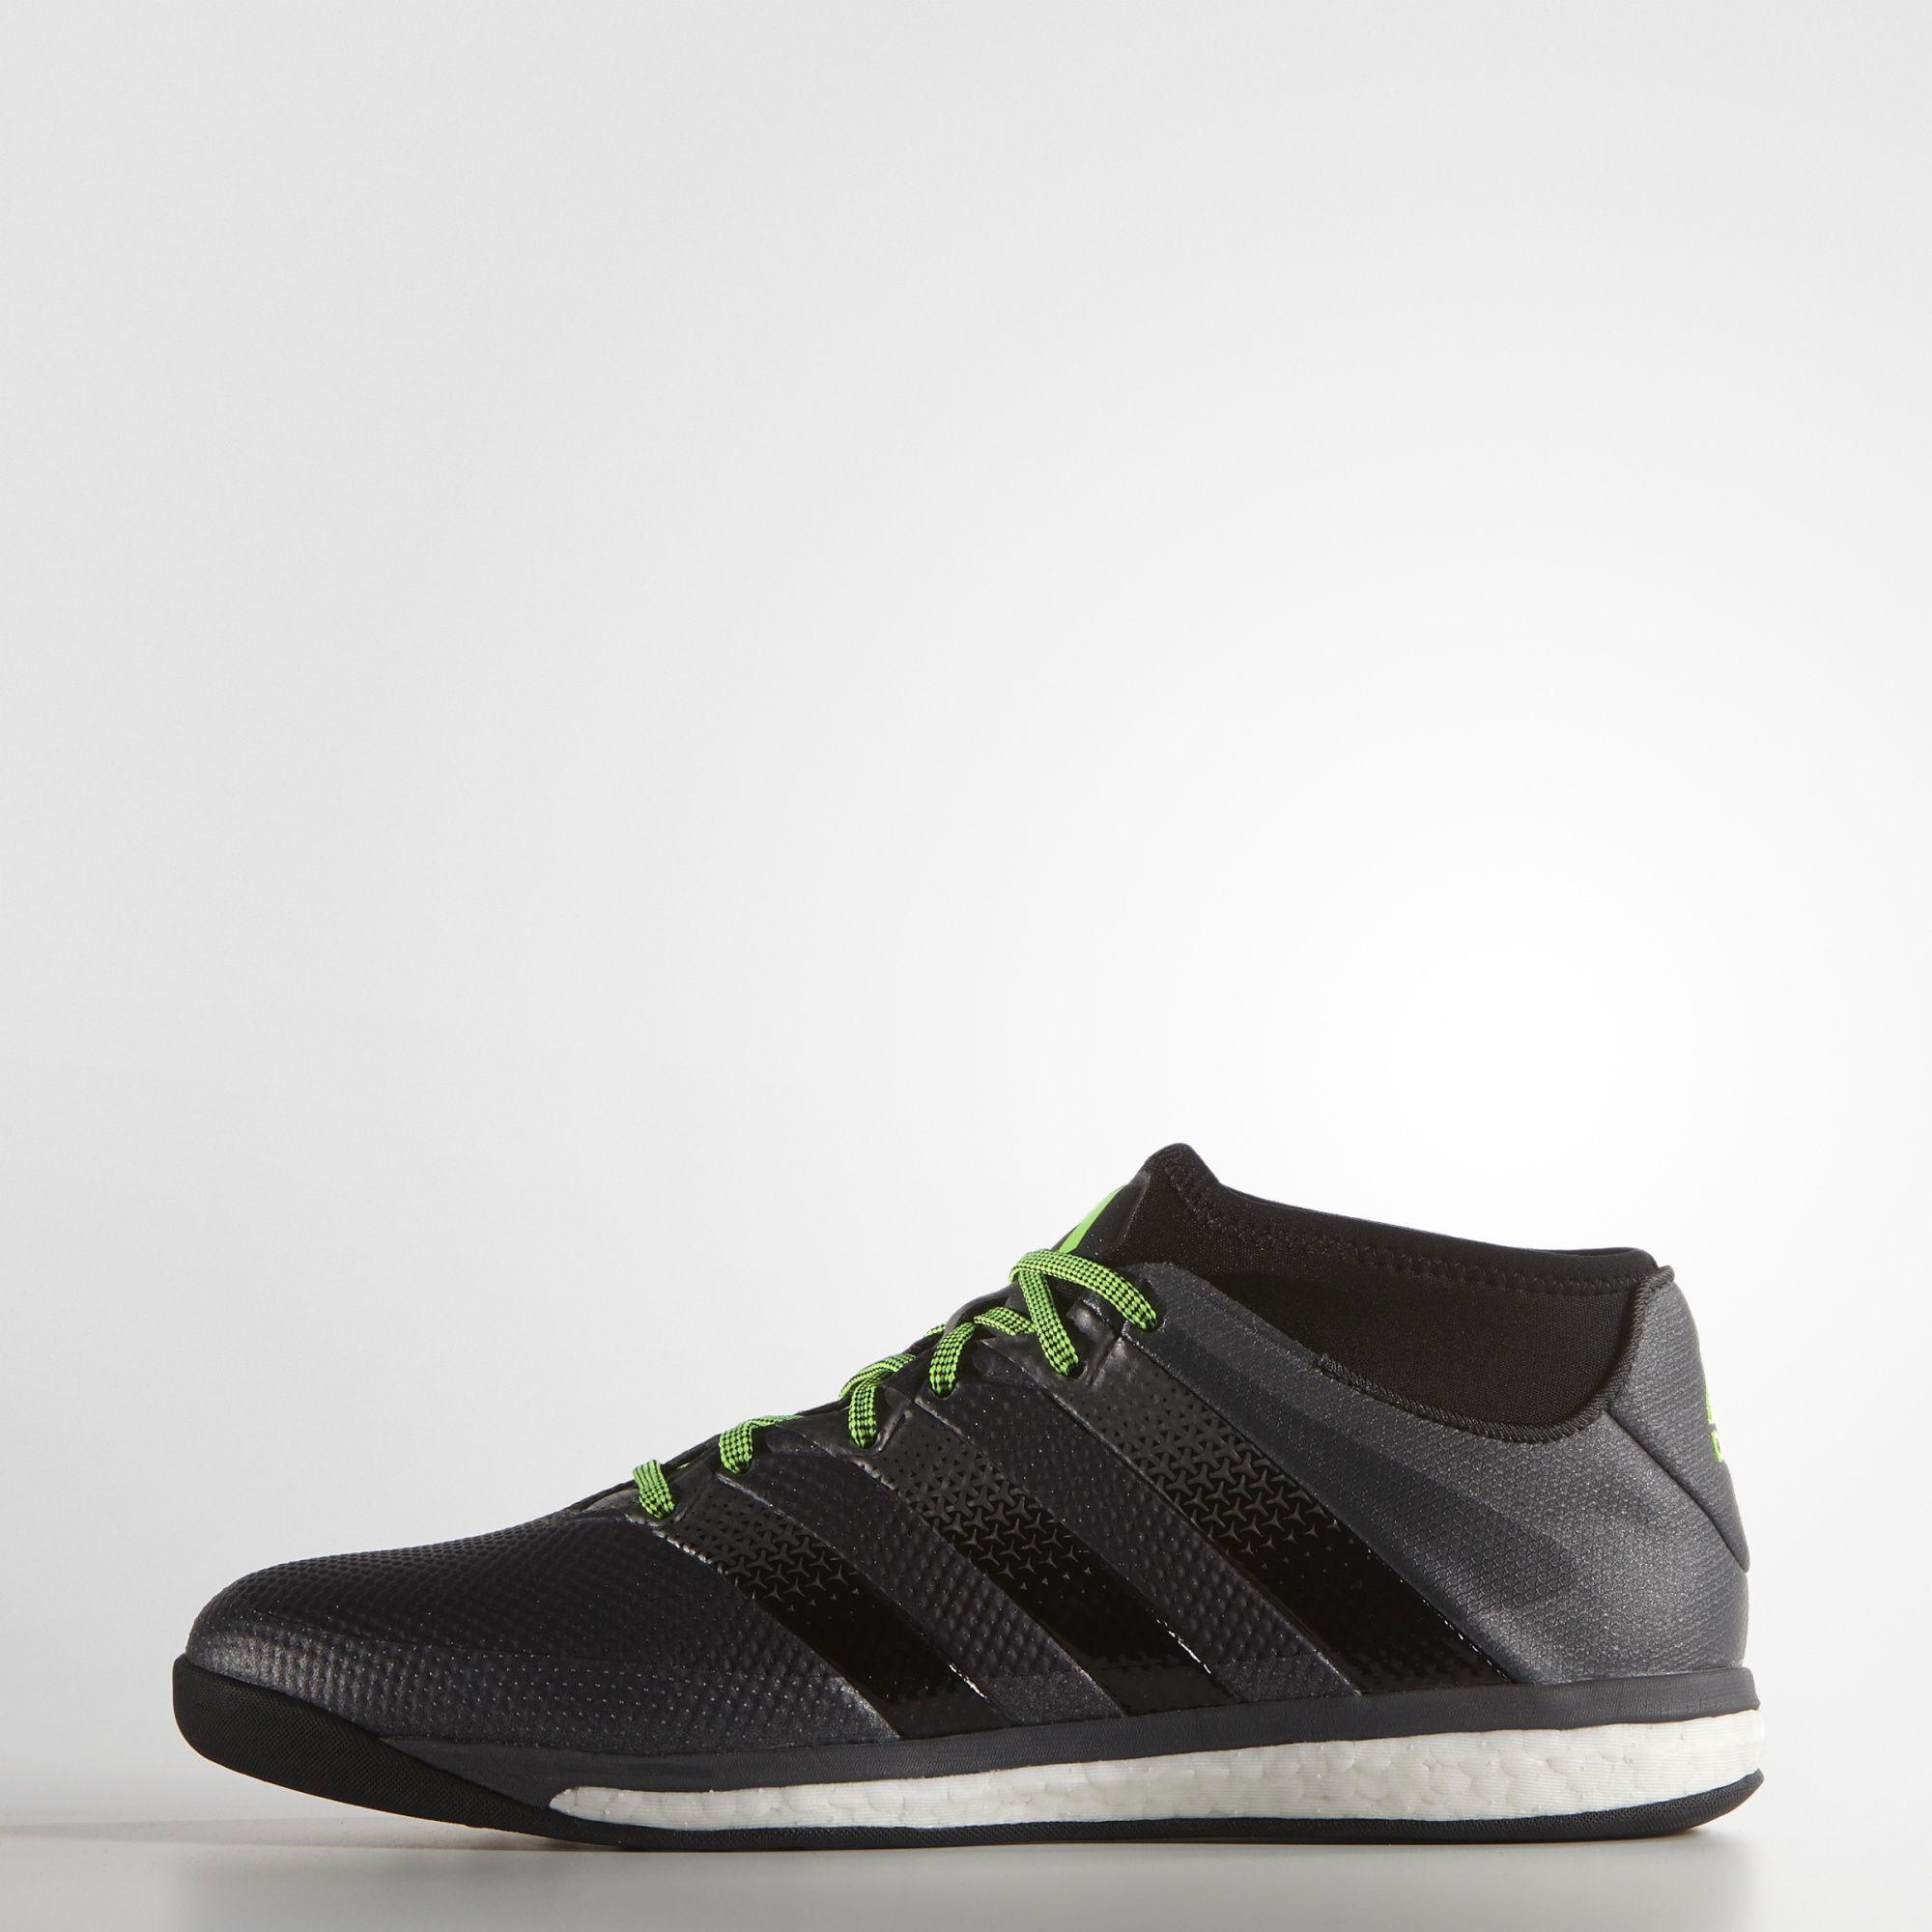 84d0605f9 ... sweden adidas ace 16.1 street black grey 67f47 bacf7